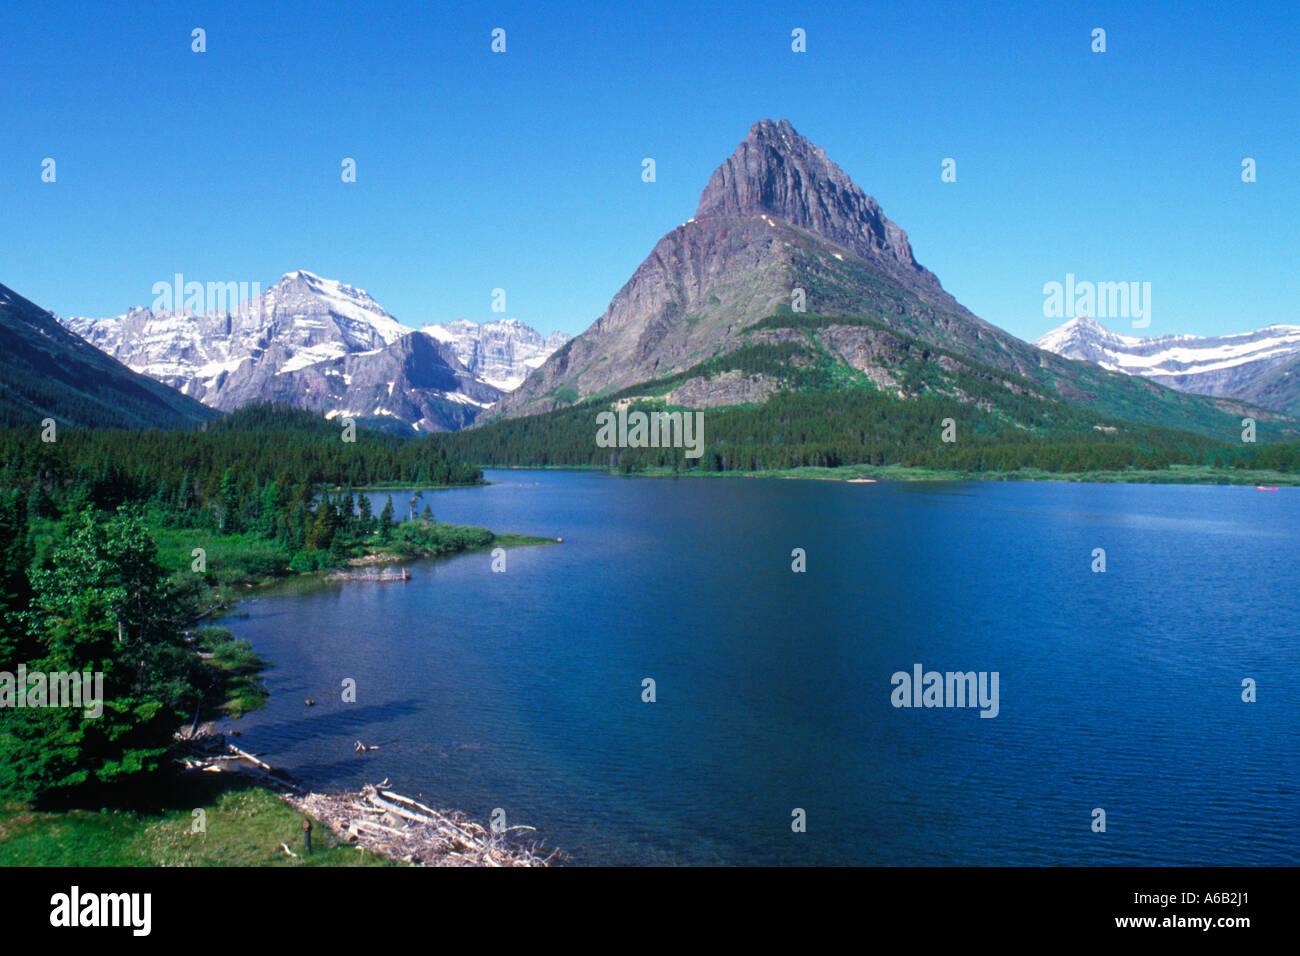 usa montana glacier national park mount grinnell swiftcurrent lake